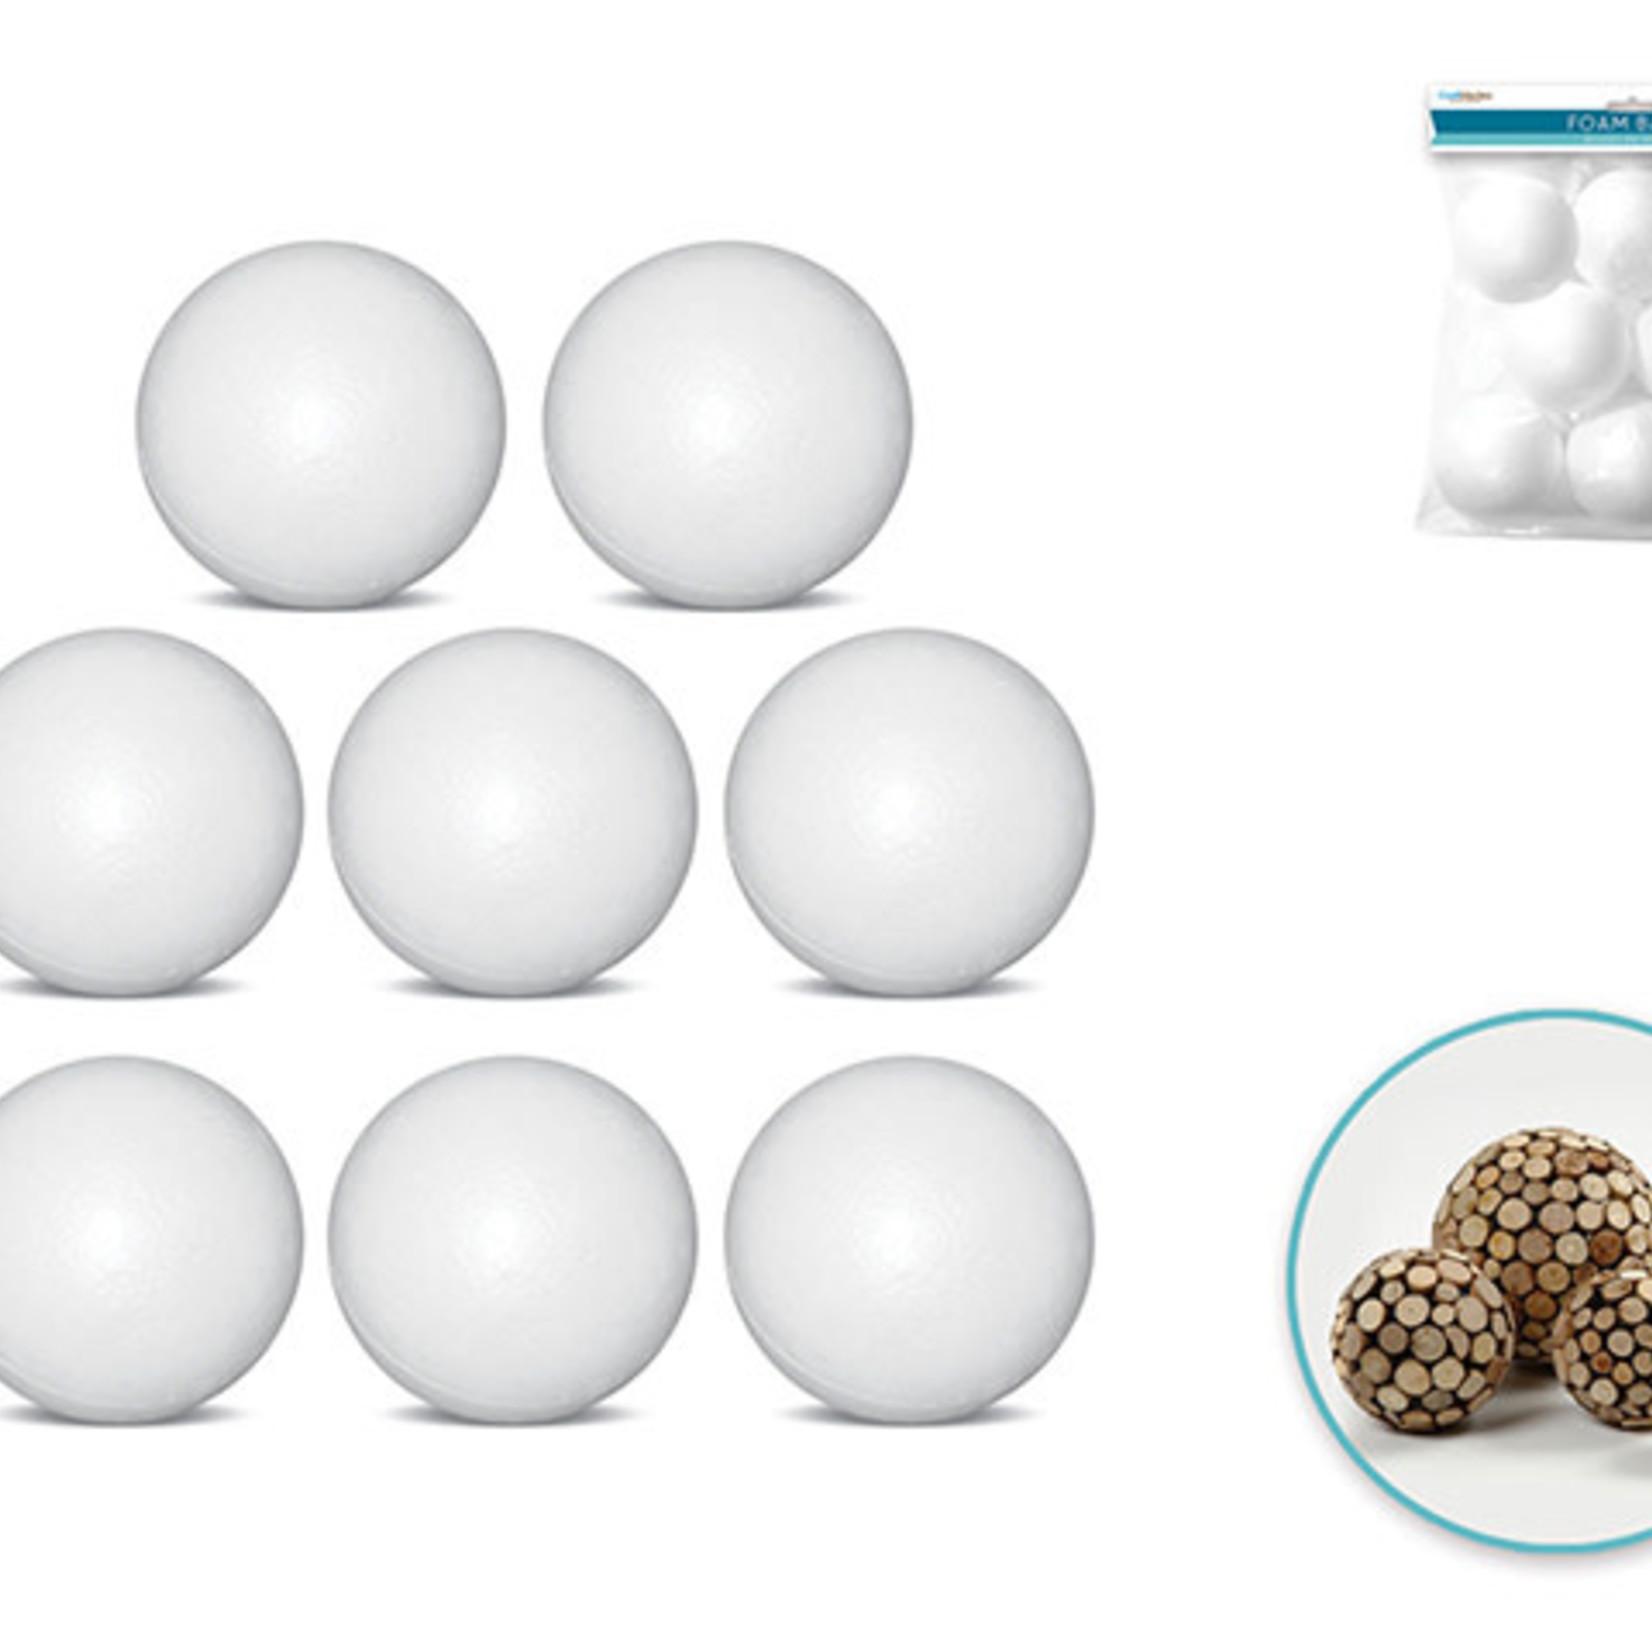 Ployfoam Balls - 8 pack of 2.45